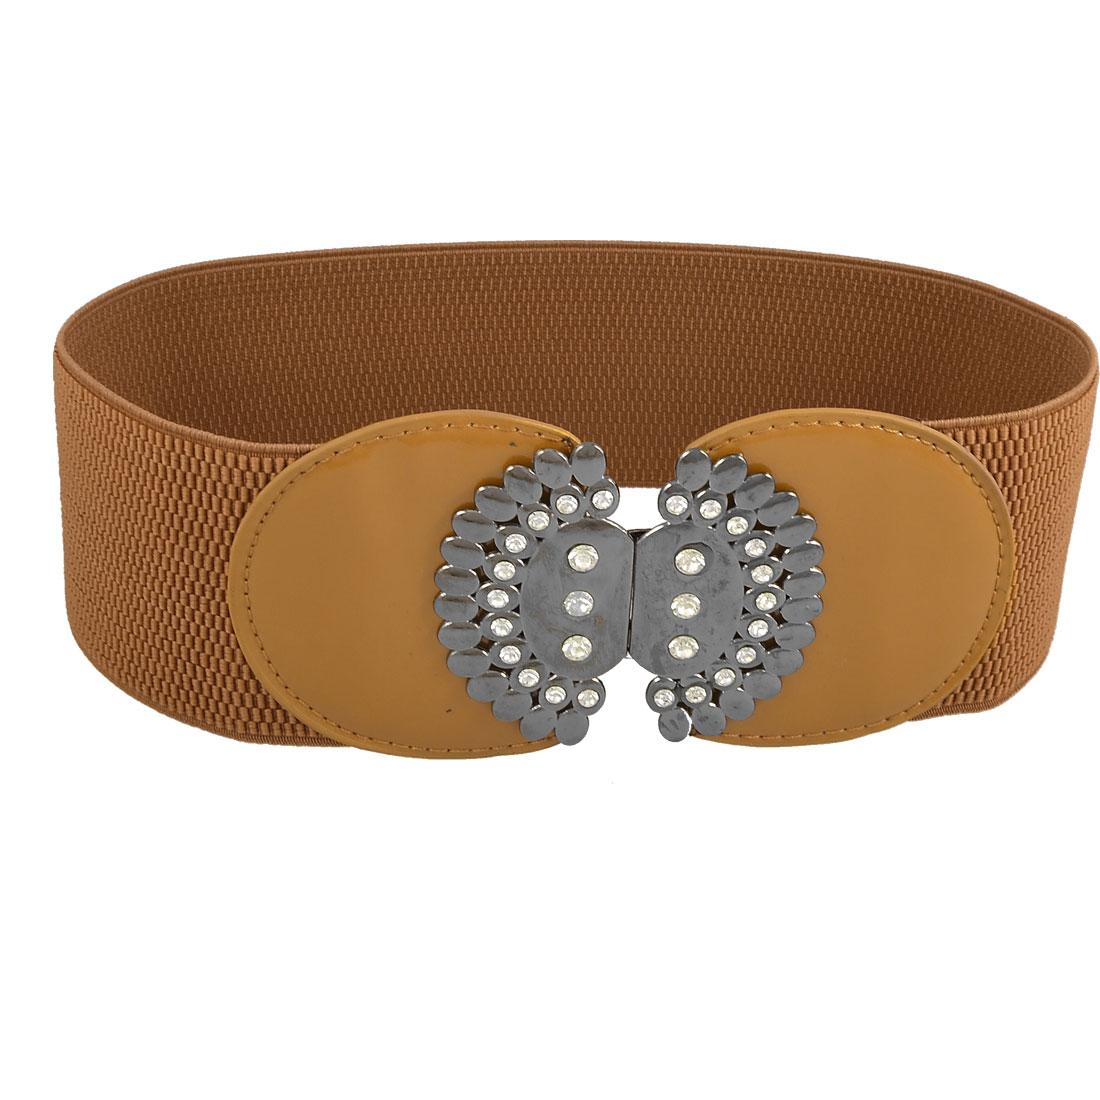 "Brown Metal Interlocking Buckle 2.9"" Width Stretch Waist Belt for Woman"